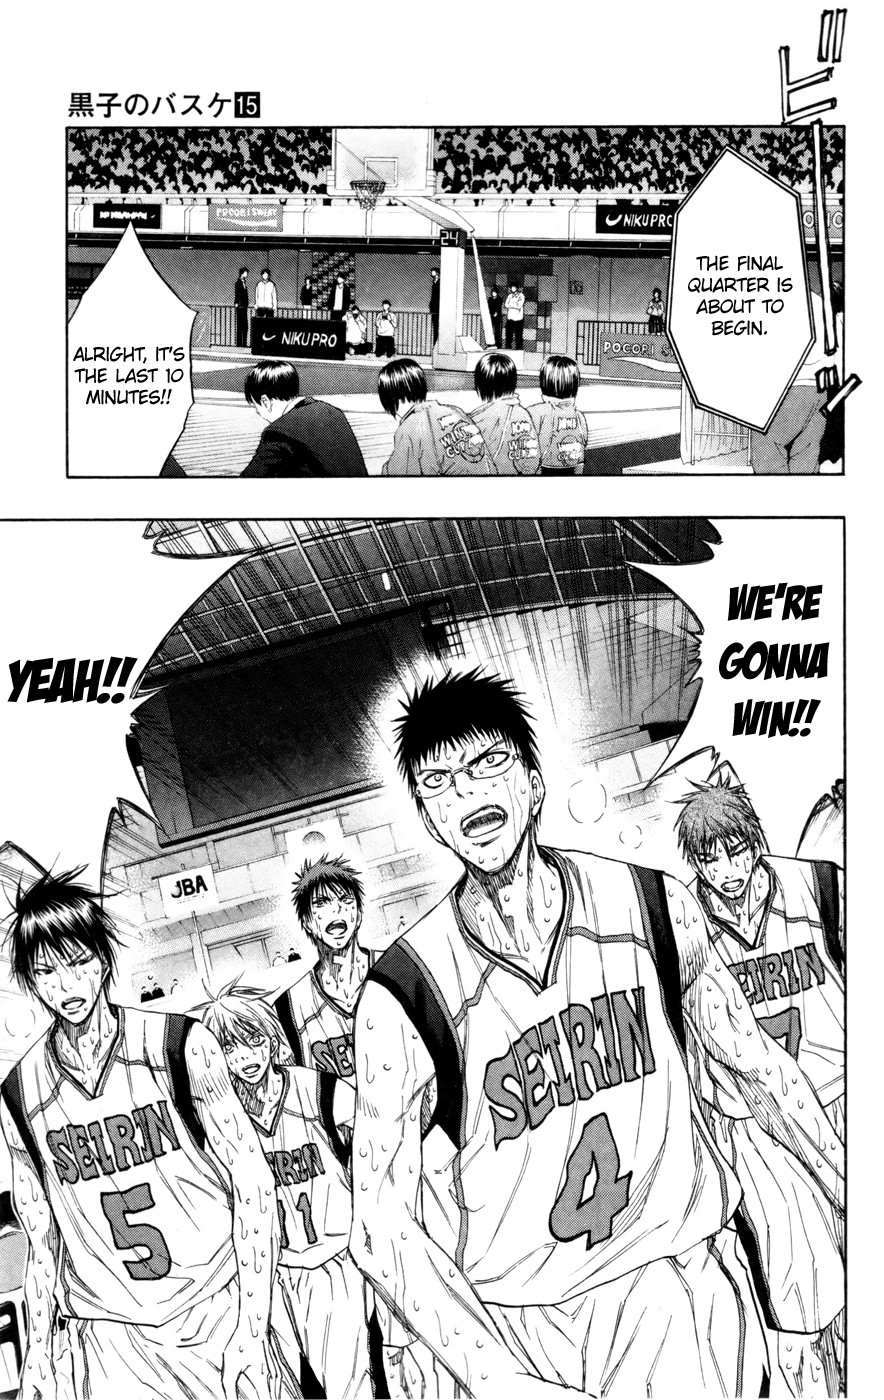 Kuroko no Basket Manga Chapter 130 - Image 10